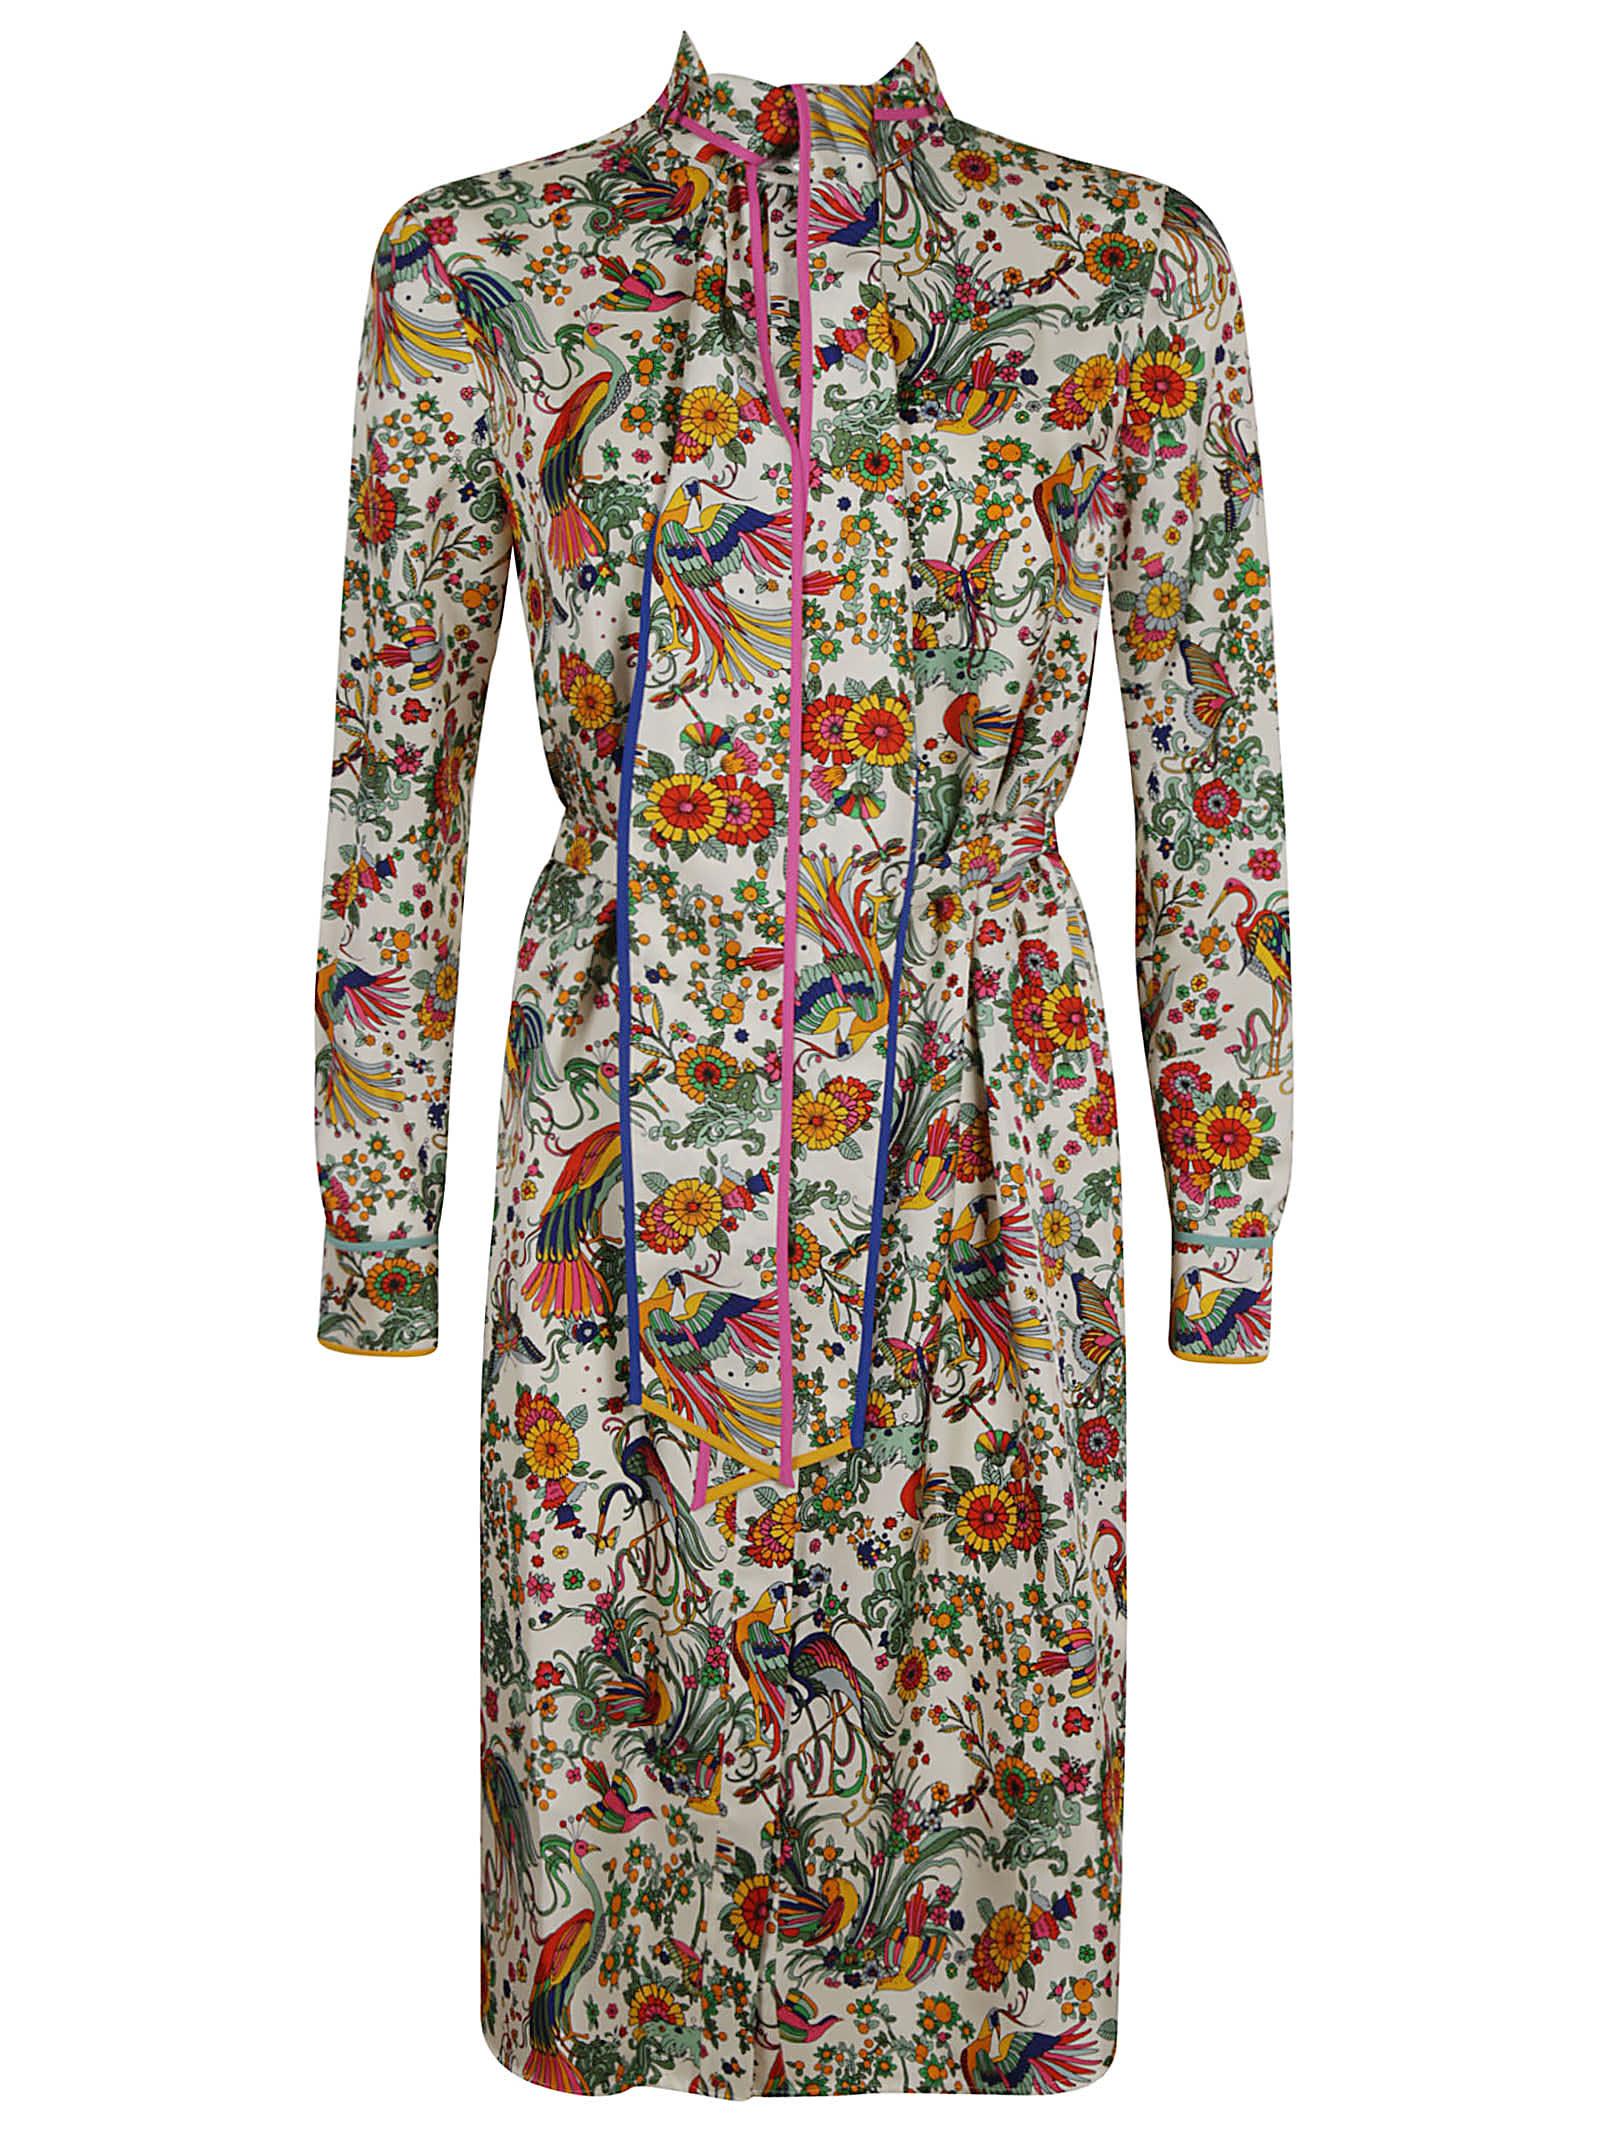 Buy Tory Burch Contrast Binding Printed Shirt Dress online, shop Tory Burch with free shipping